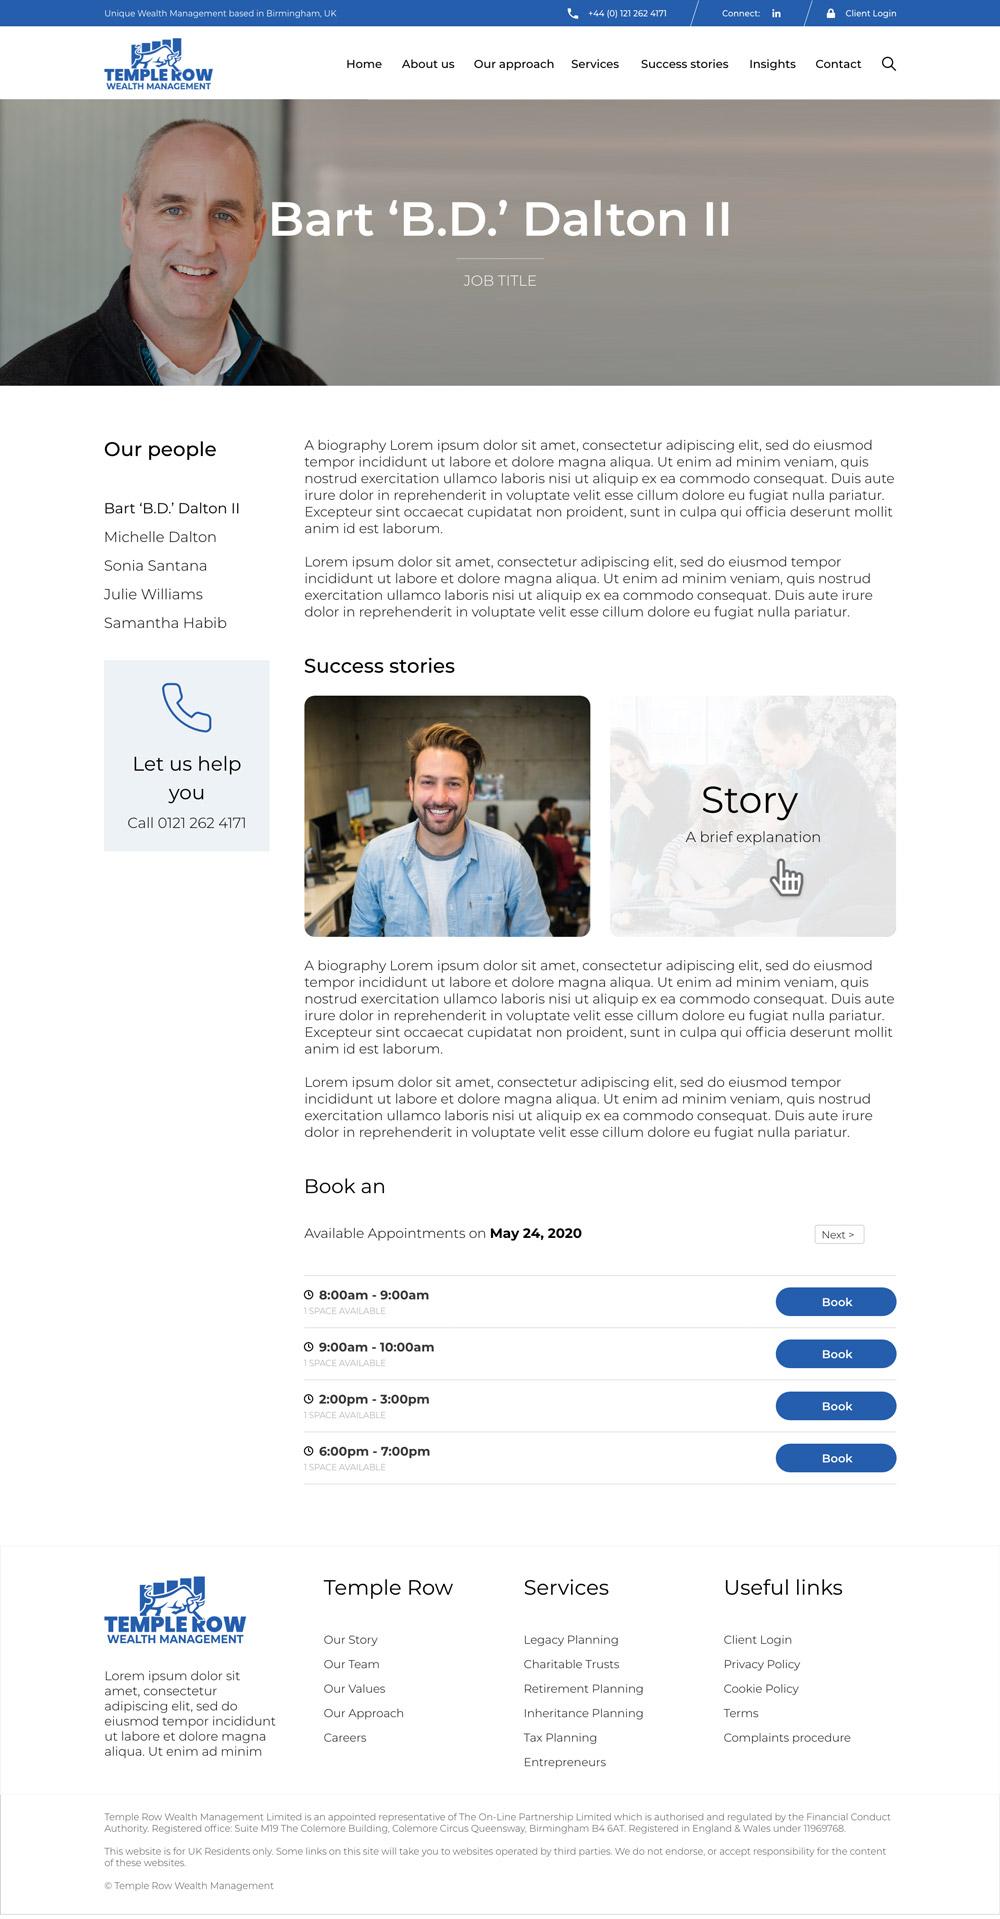 noble-digital-casestudy-temple-row-wealth-management-design-5-staff